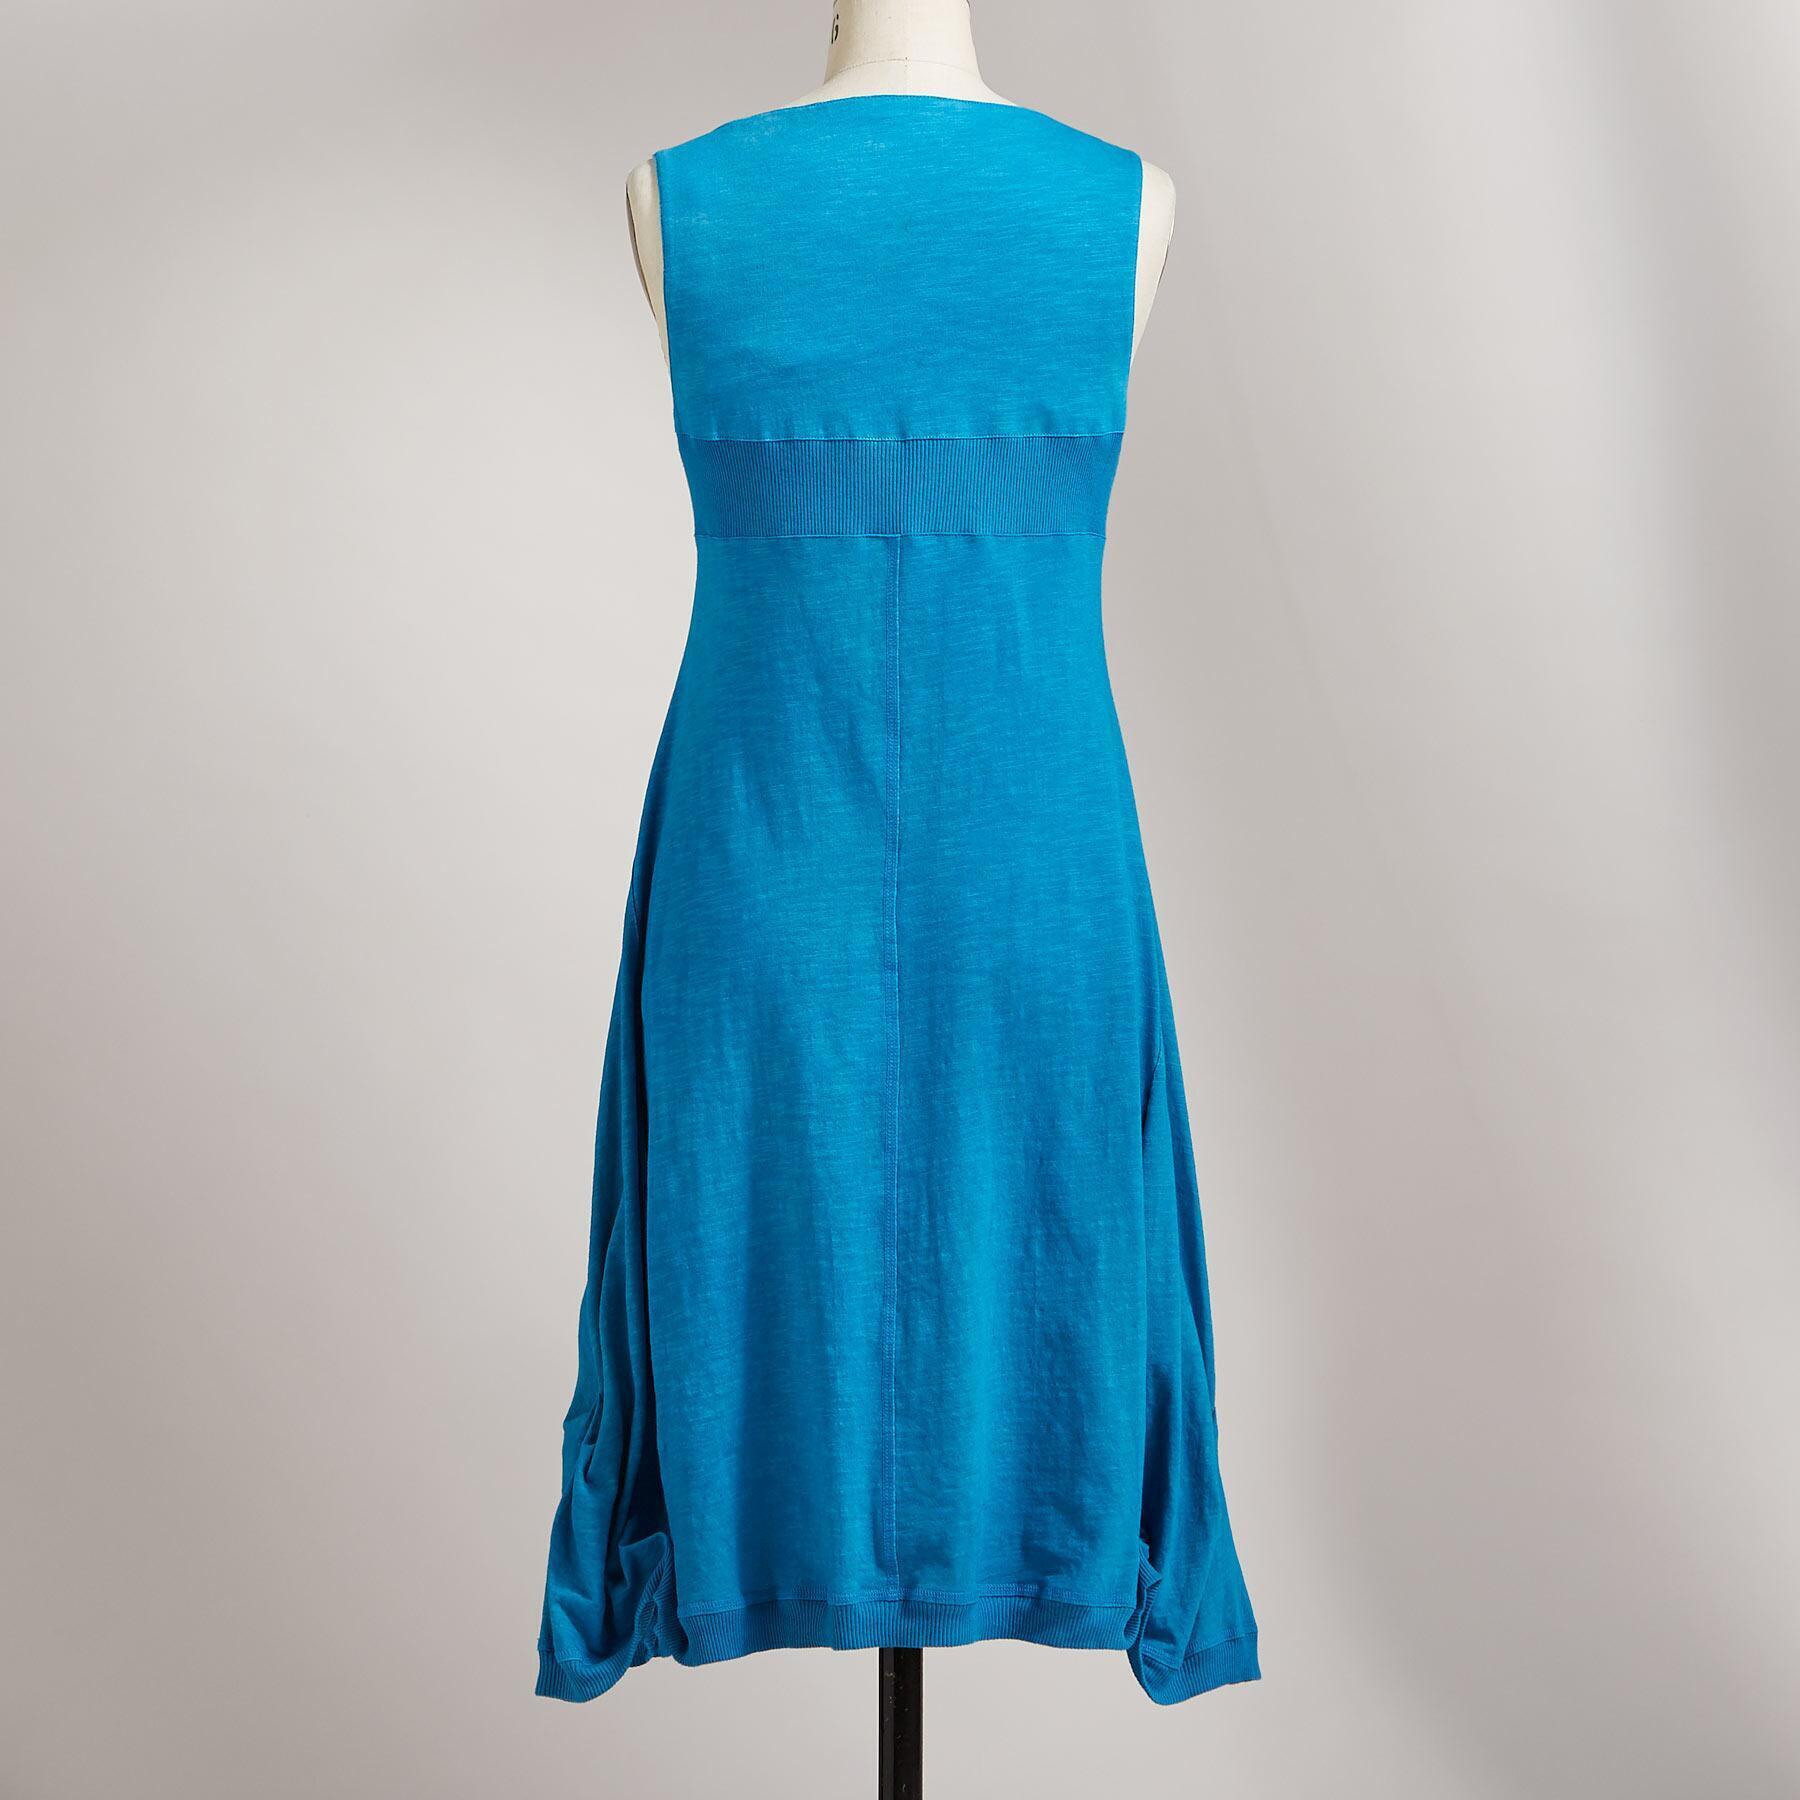 COOL BREEZE DRESS: View 2